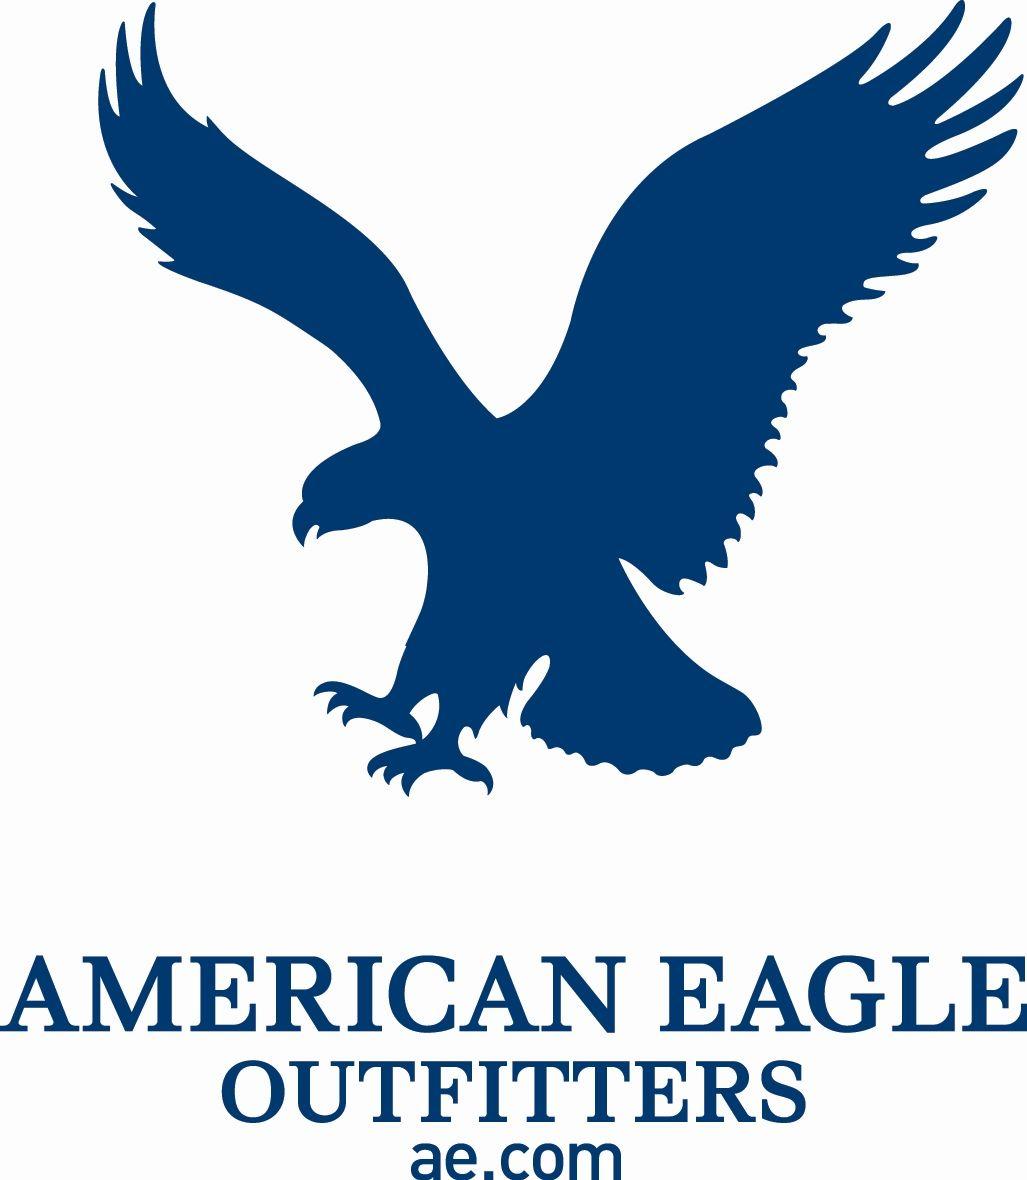 d1bcc29c010 american eagle